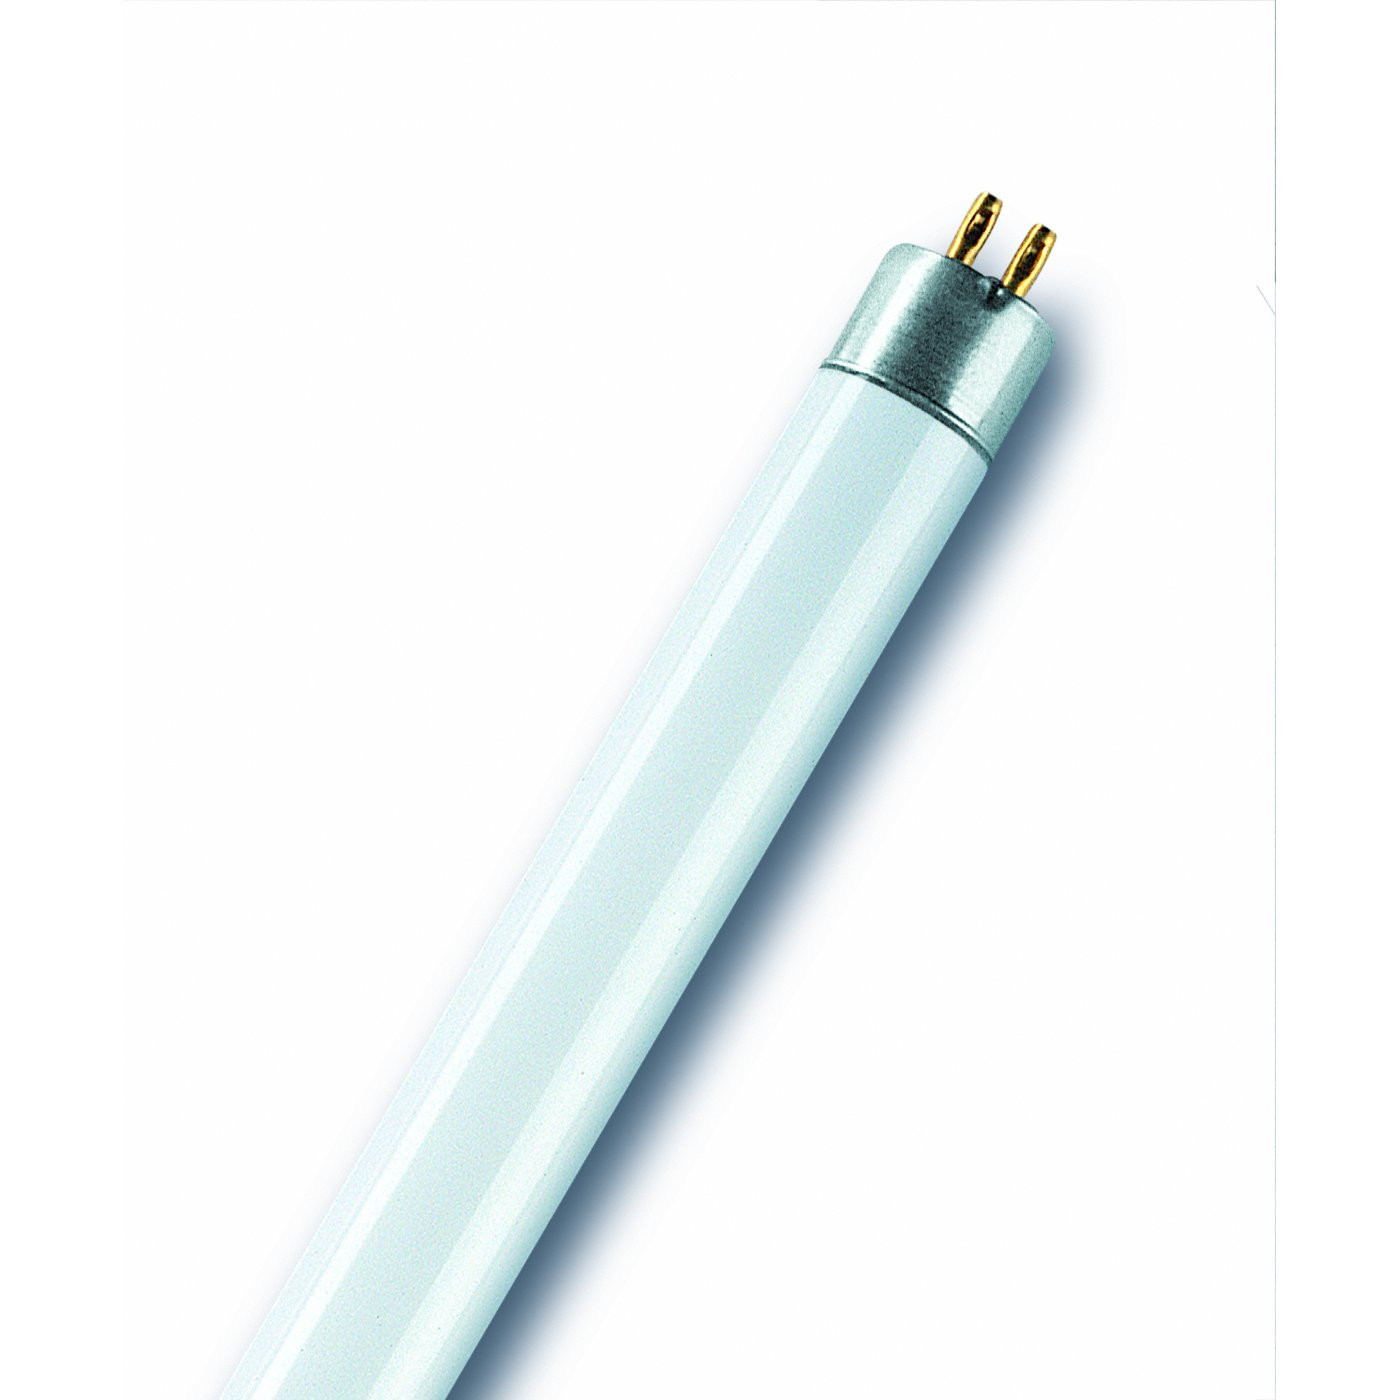 Osram Leuchtstofflampe Röhrenform T16 13W/827 G5 kurz warmweiß extra